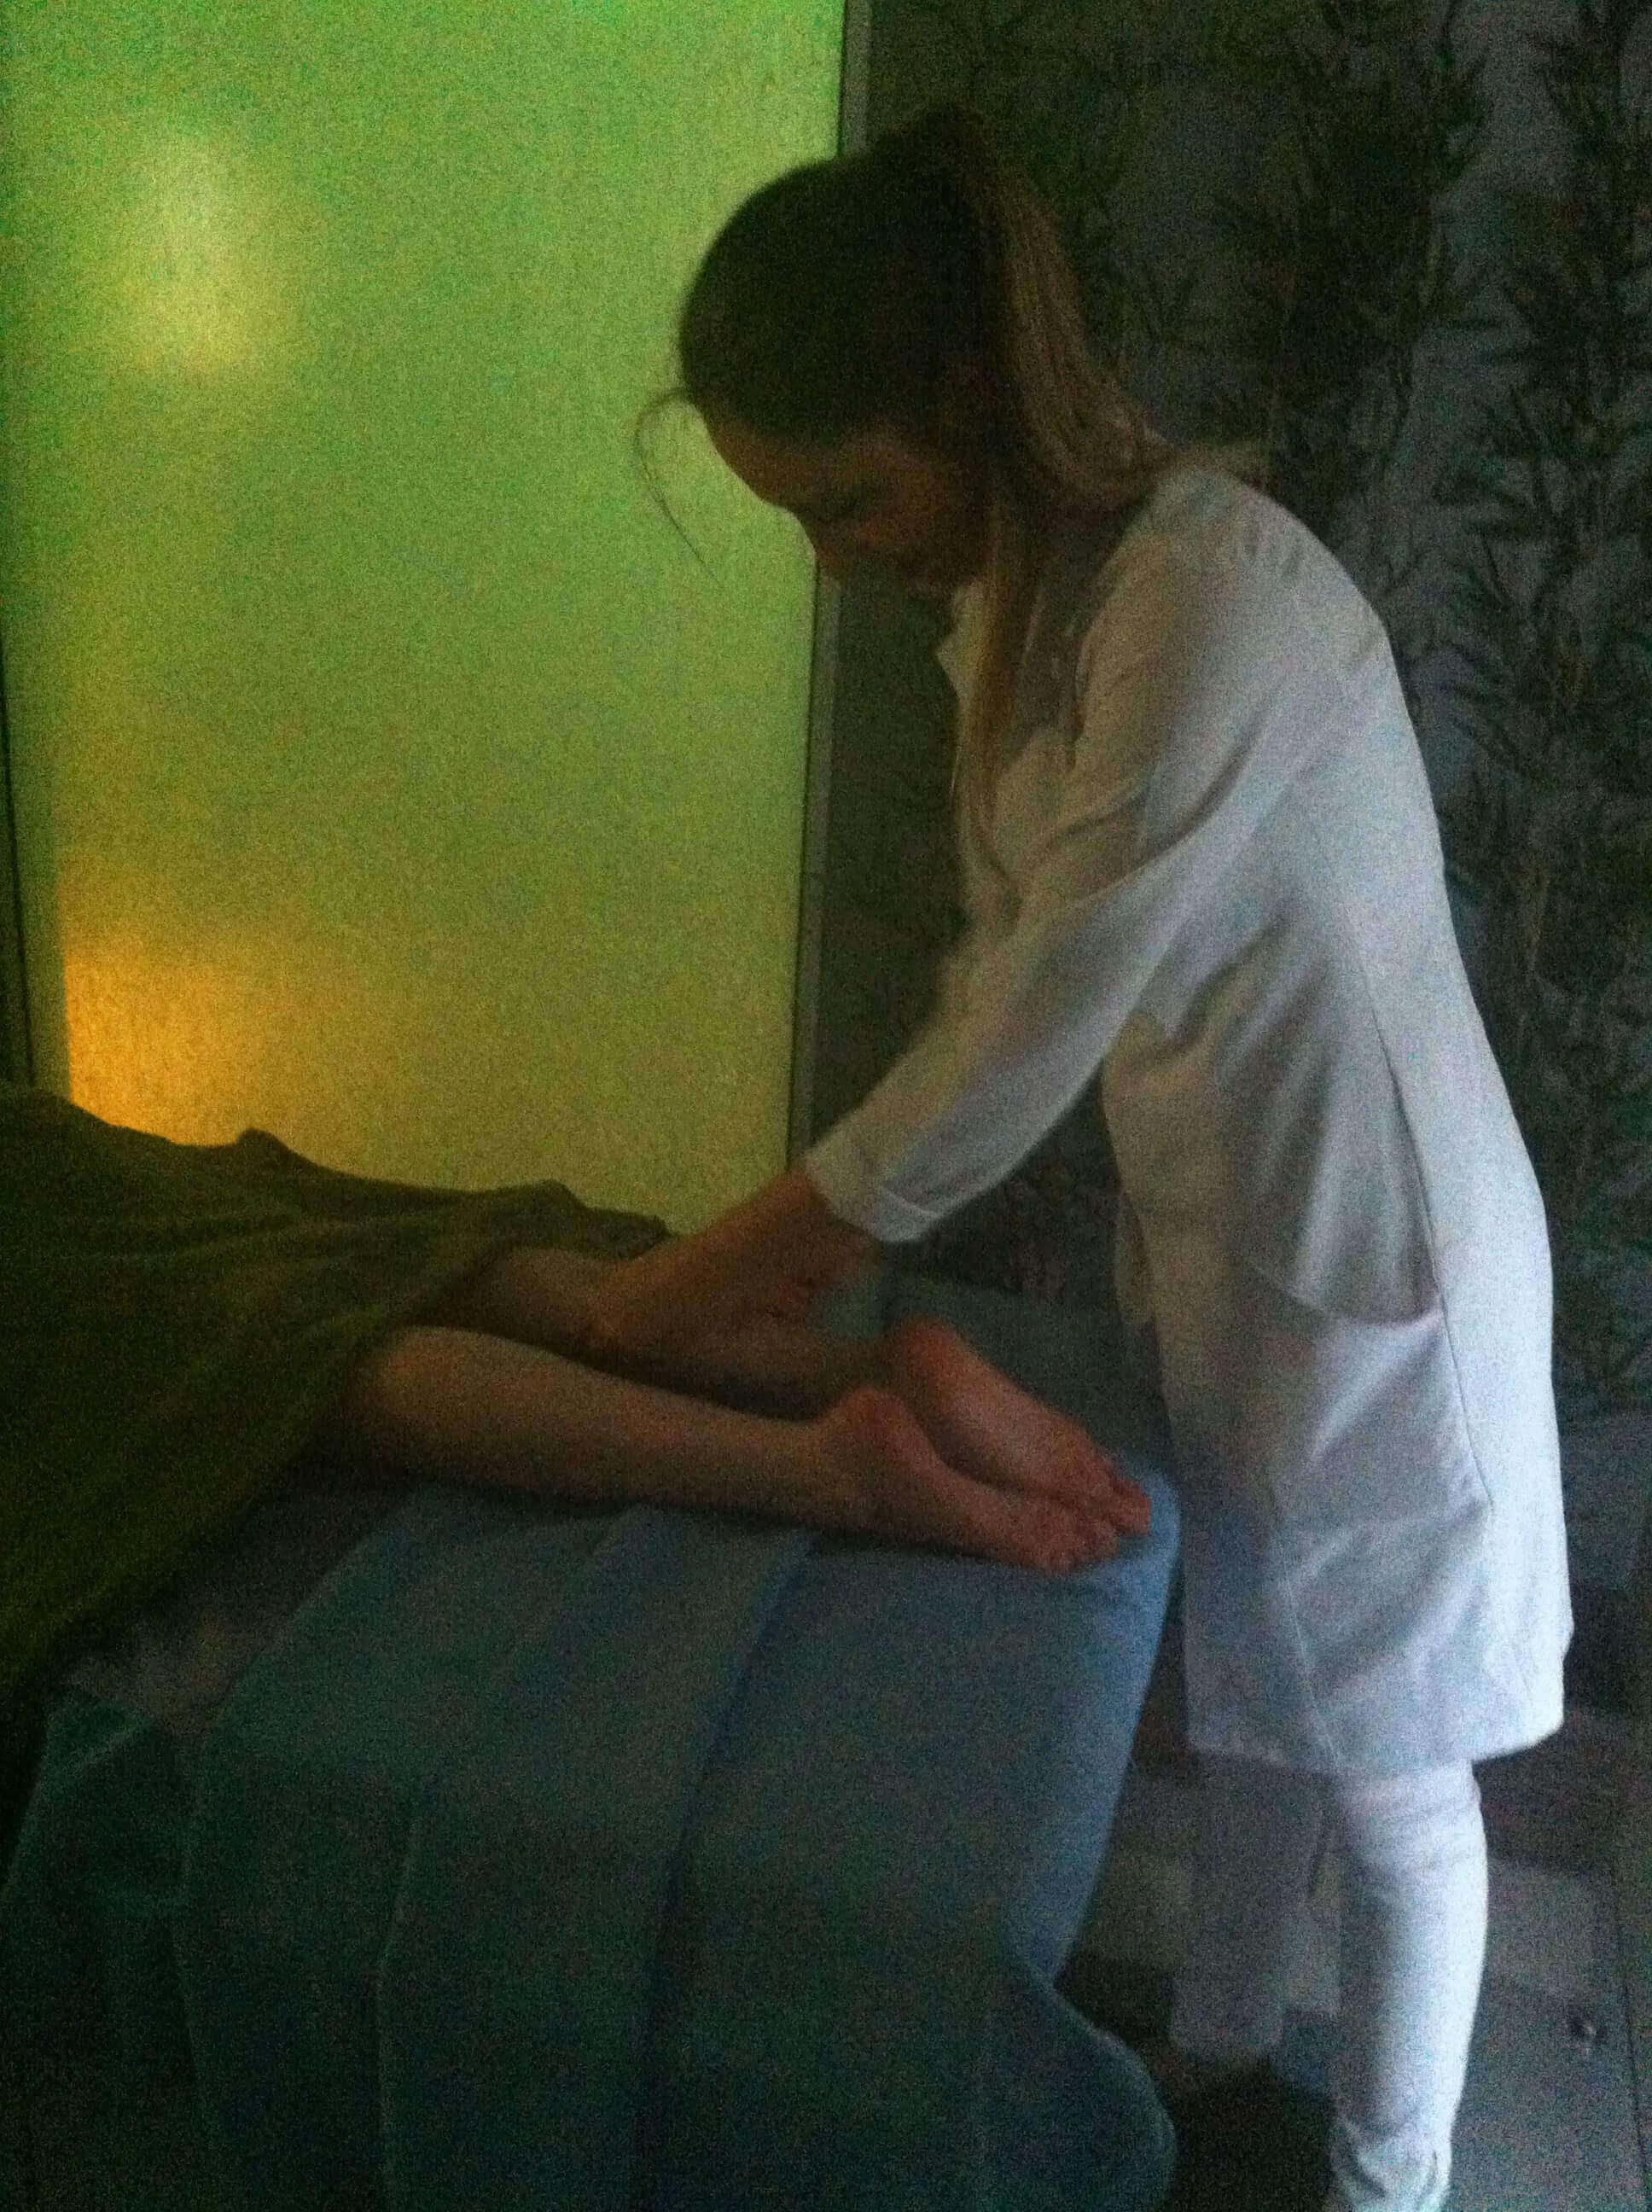 Massagem no Bambu Urban Spa by Vitaclin em Curitiba